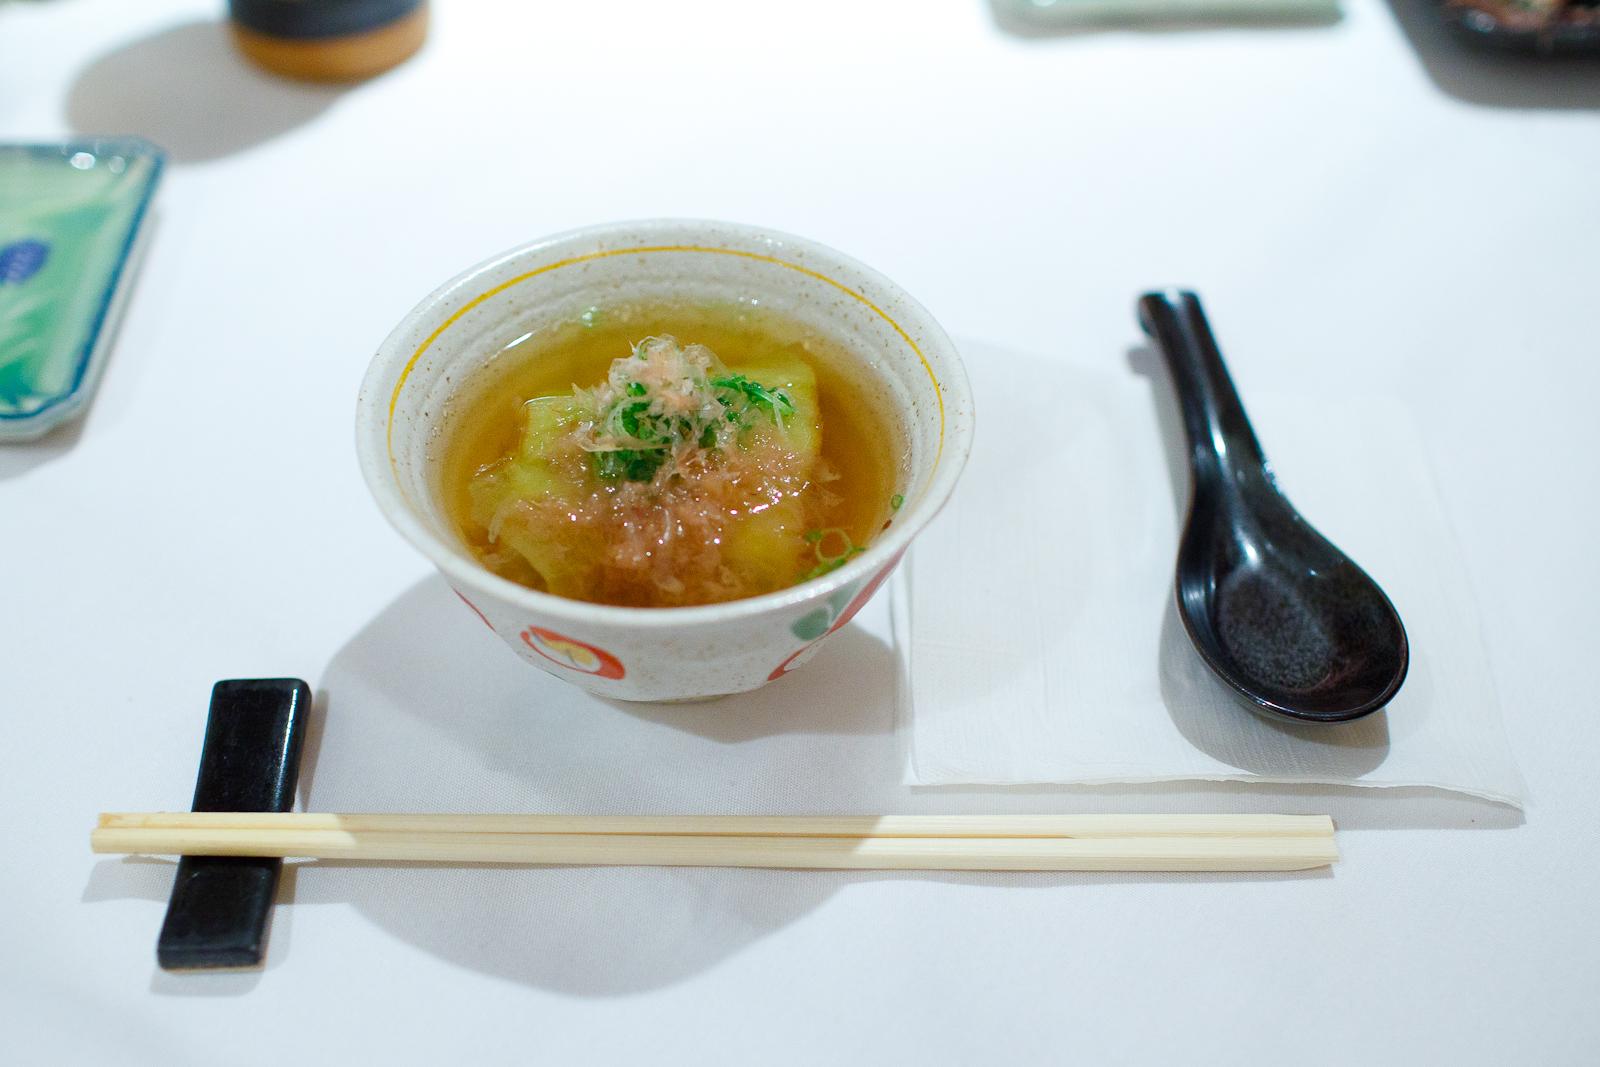 Squash soup with bonito flakes